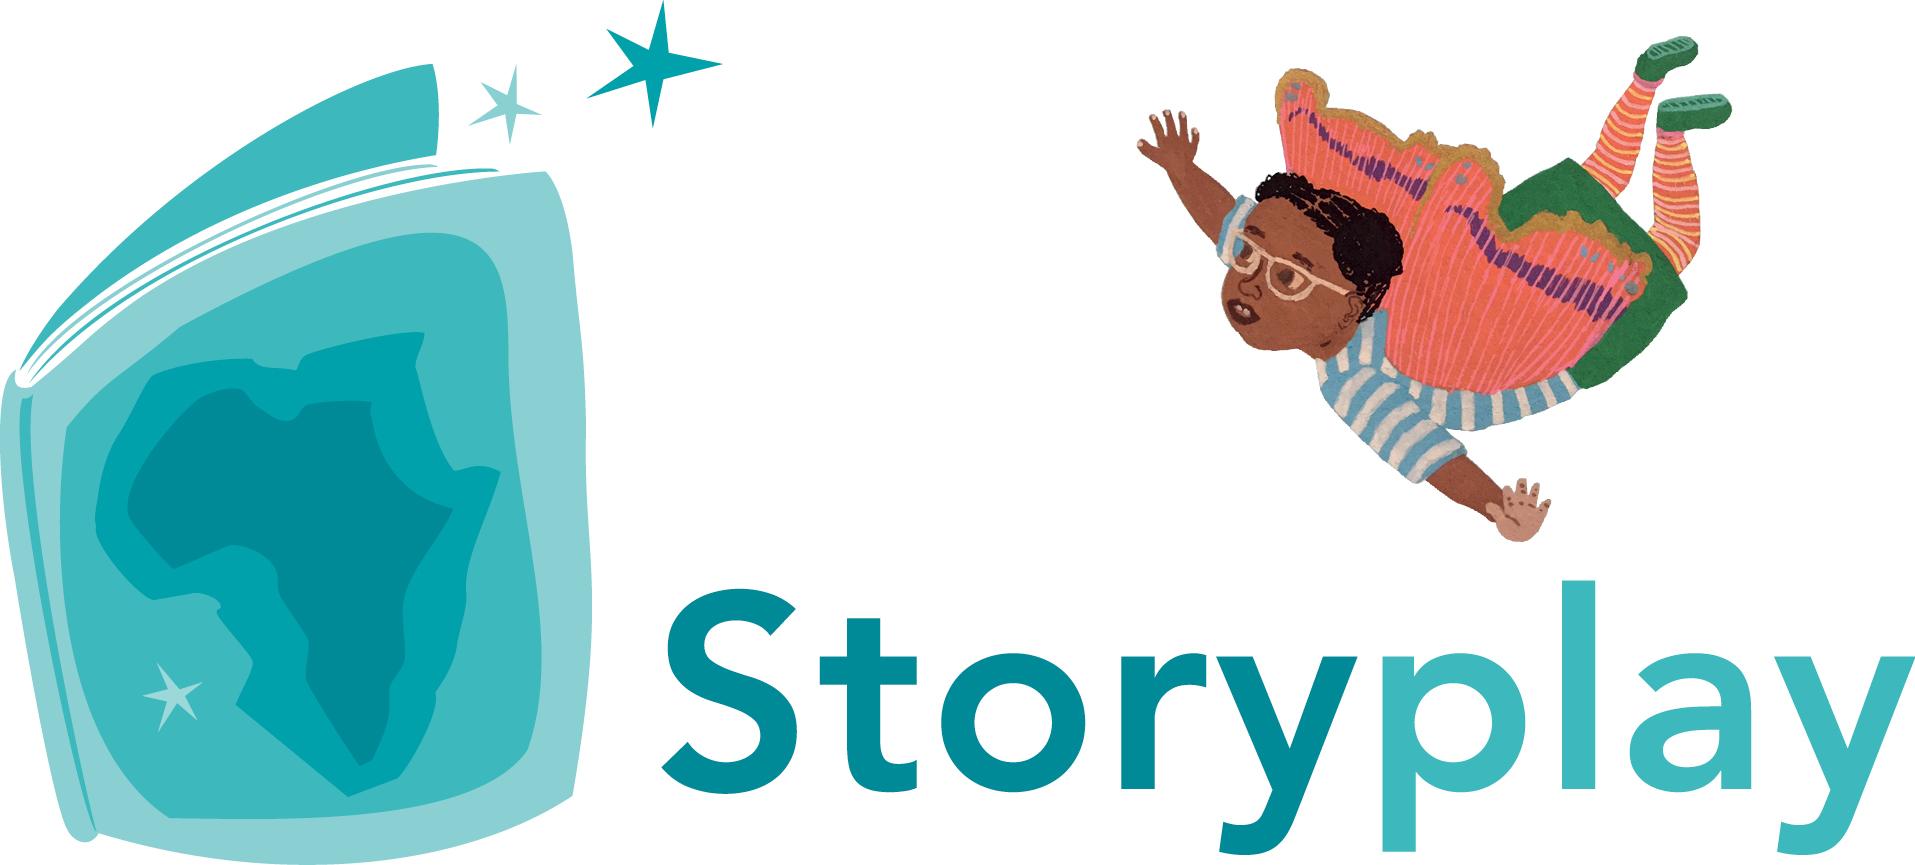 Storyplay logo